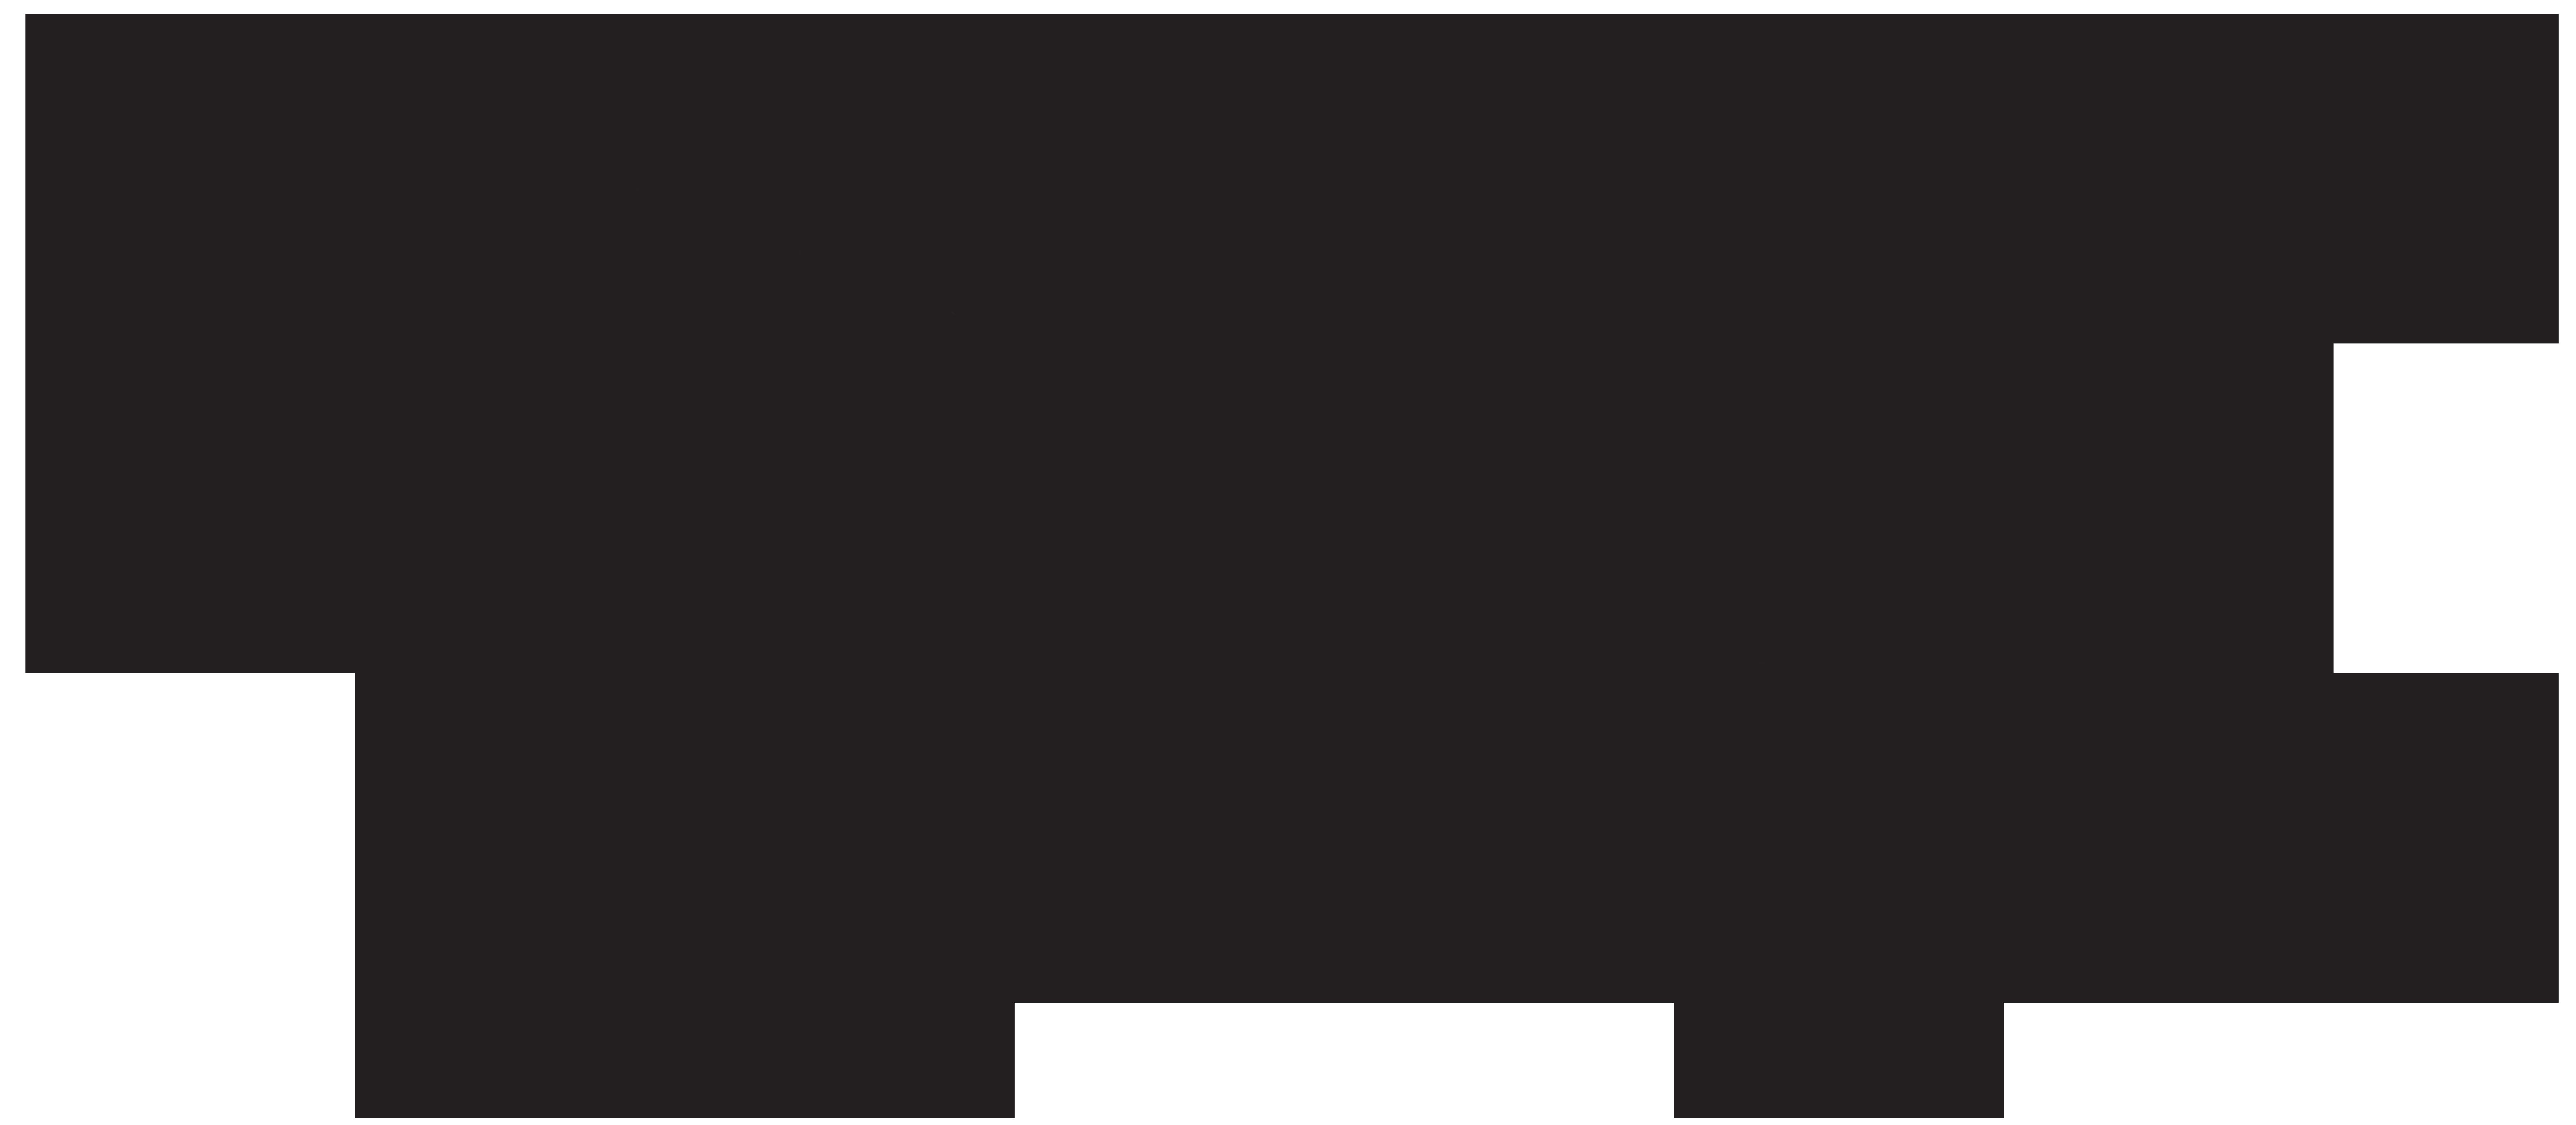 8000x3495 Plane Clipart Silhouette